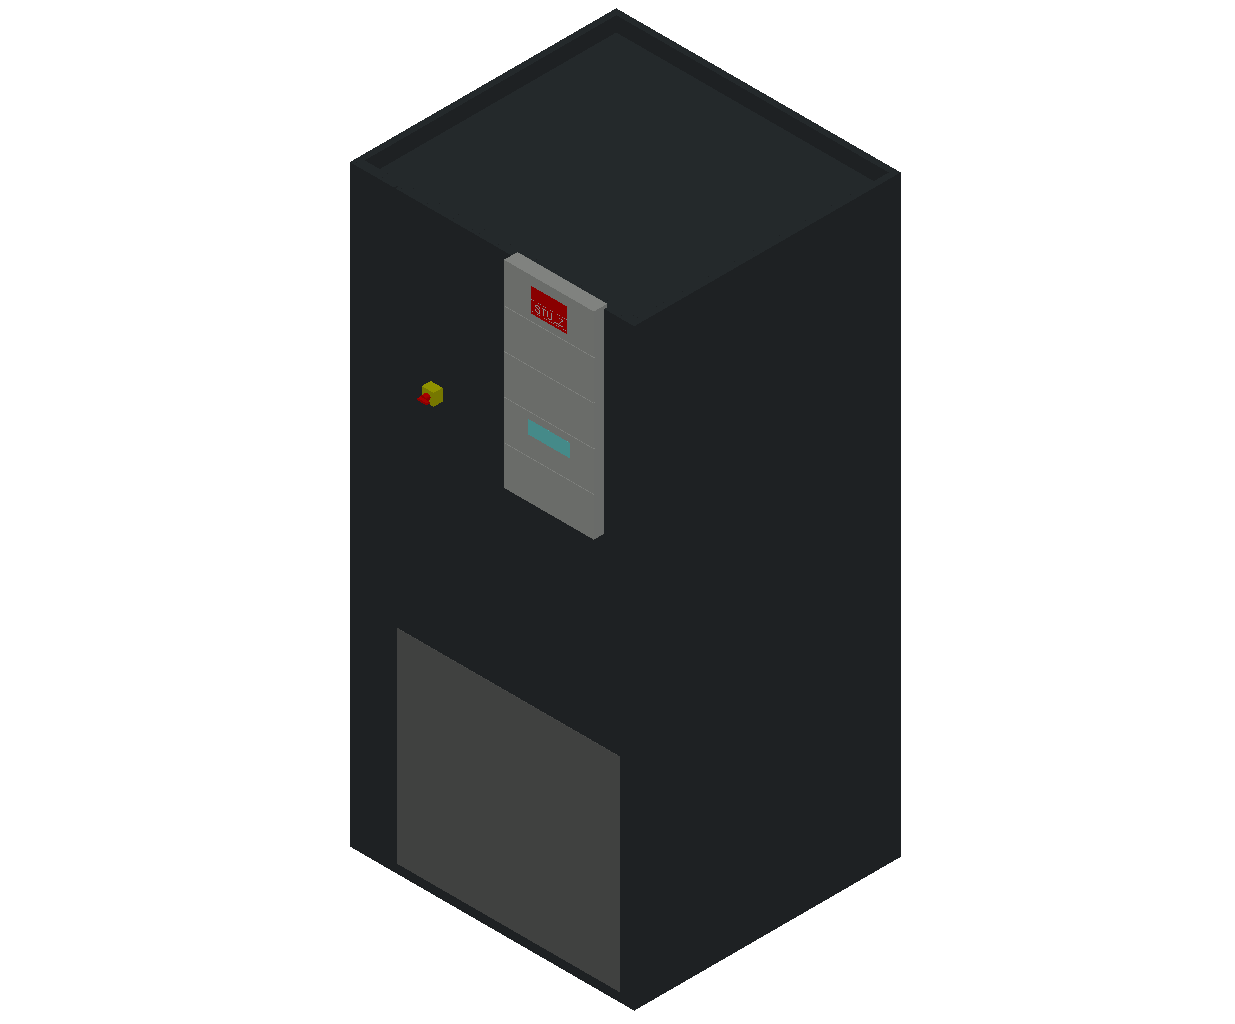 HC_Air Conditioner_Indoor Unit_MEPcontent_STULZ_CyberAir 3PRO_ASU_CW_ASU_430_CW_INT-EN.dwg